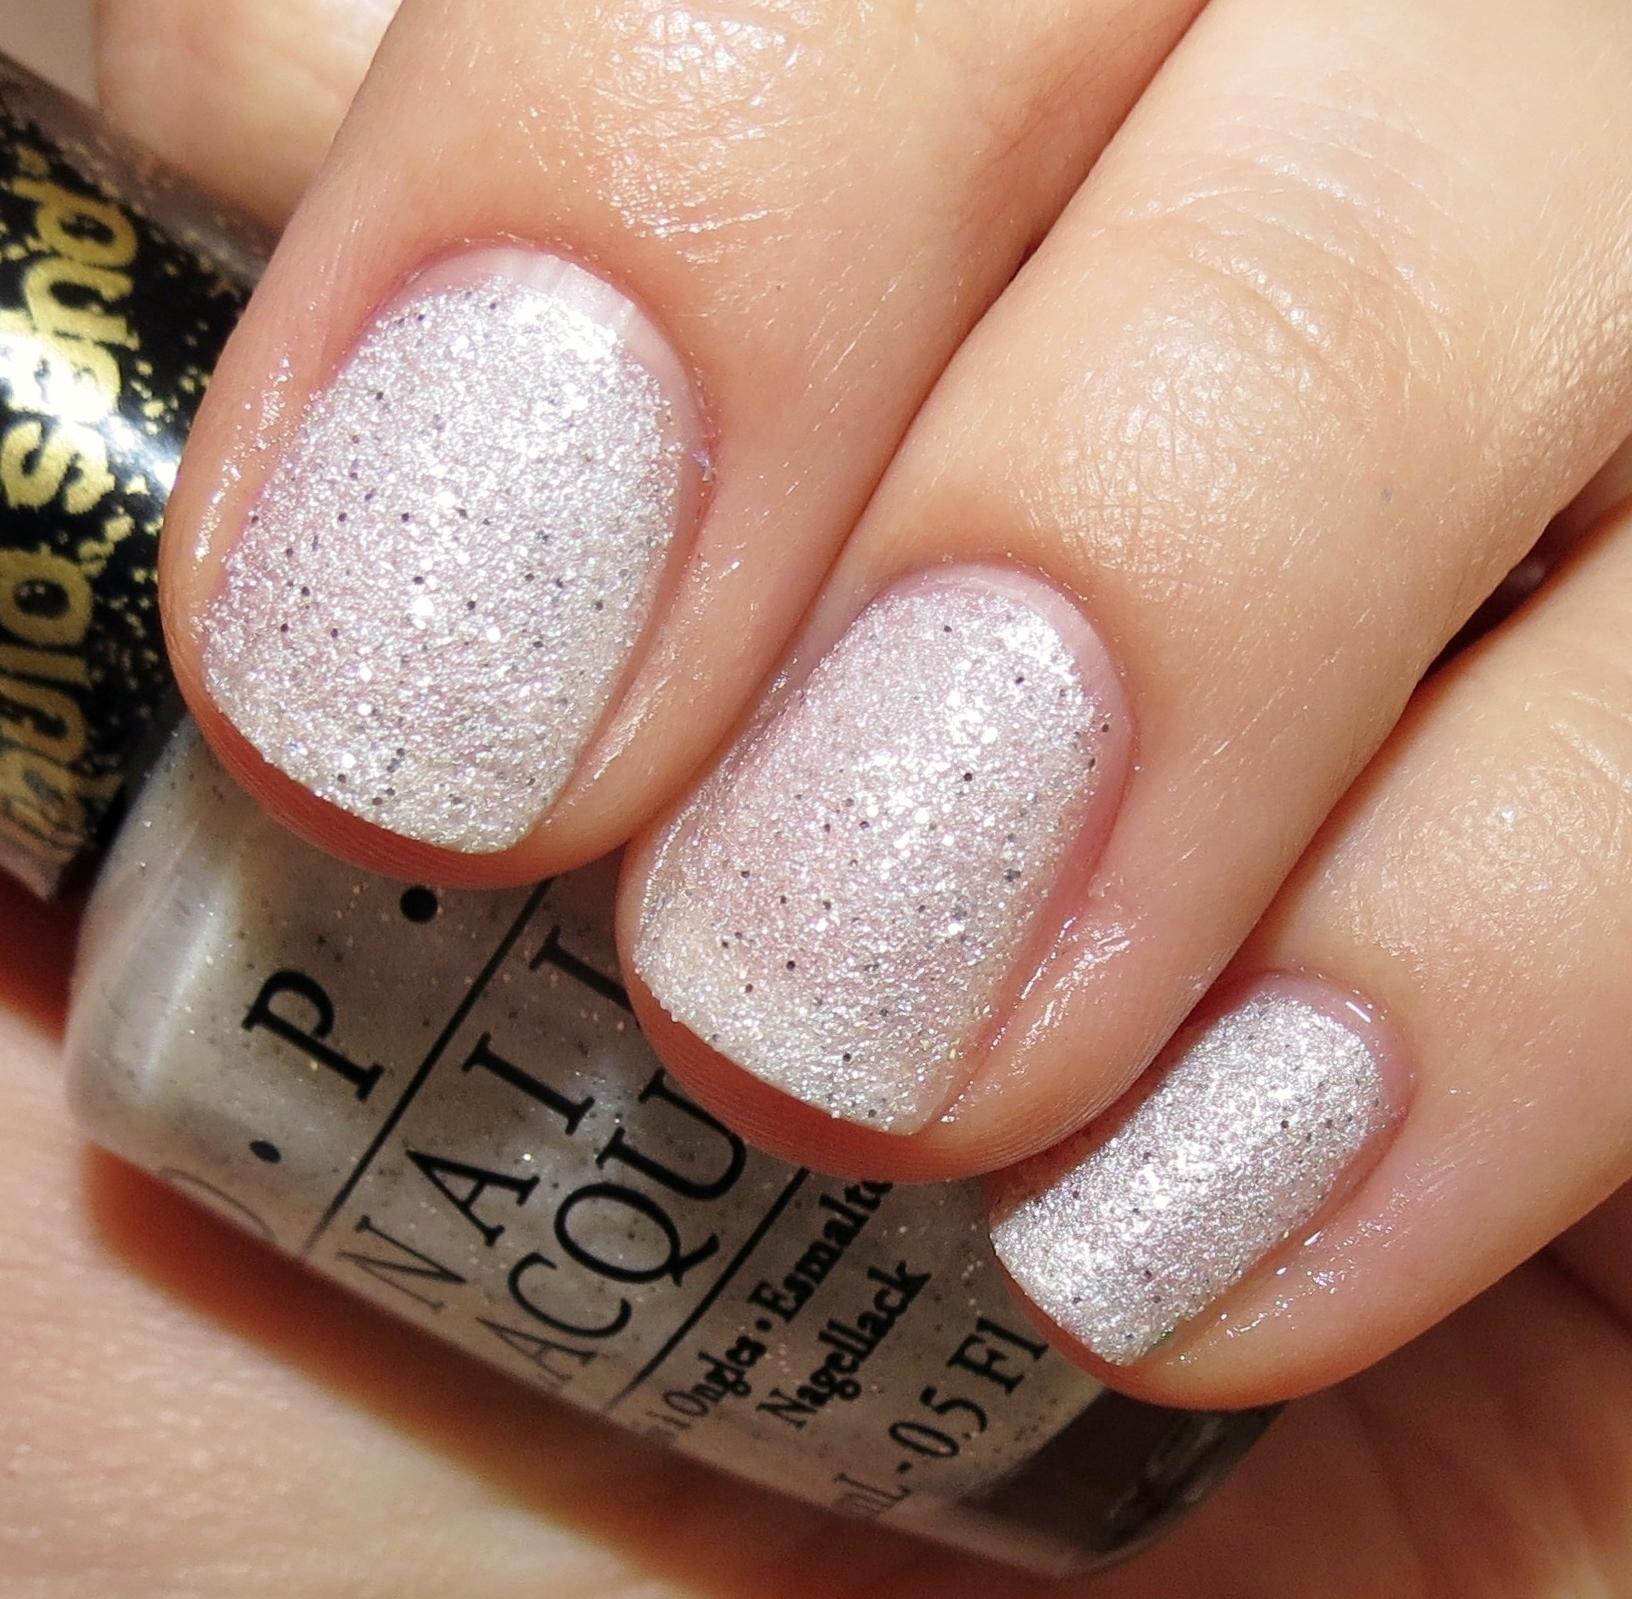 bond girlsopi liquid sand™ nail polish swatches & review